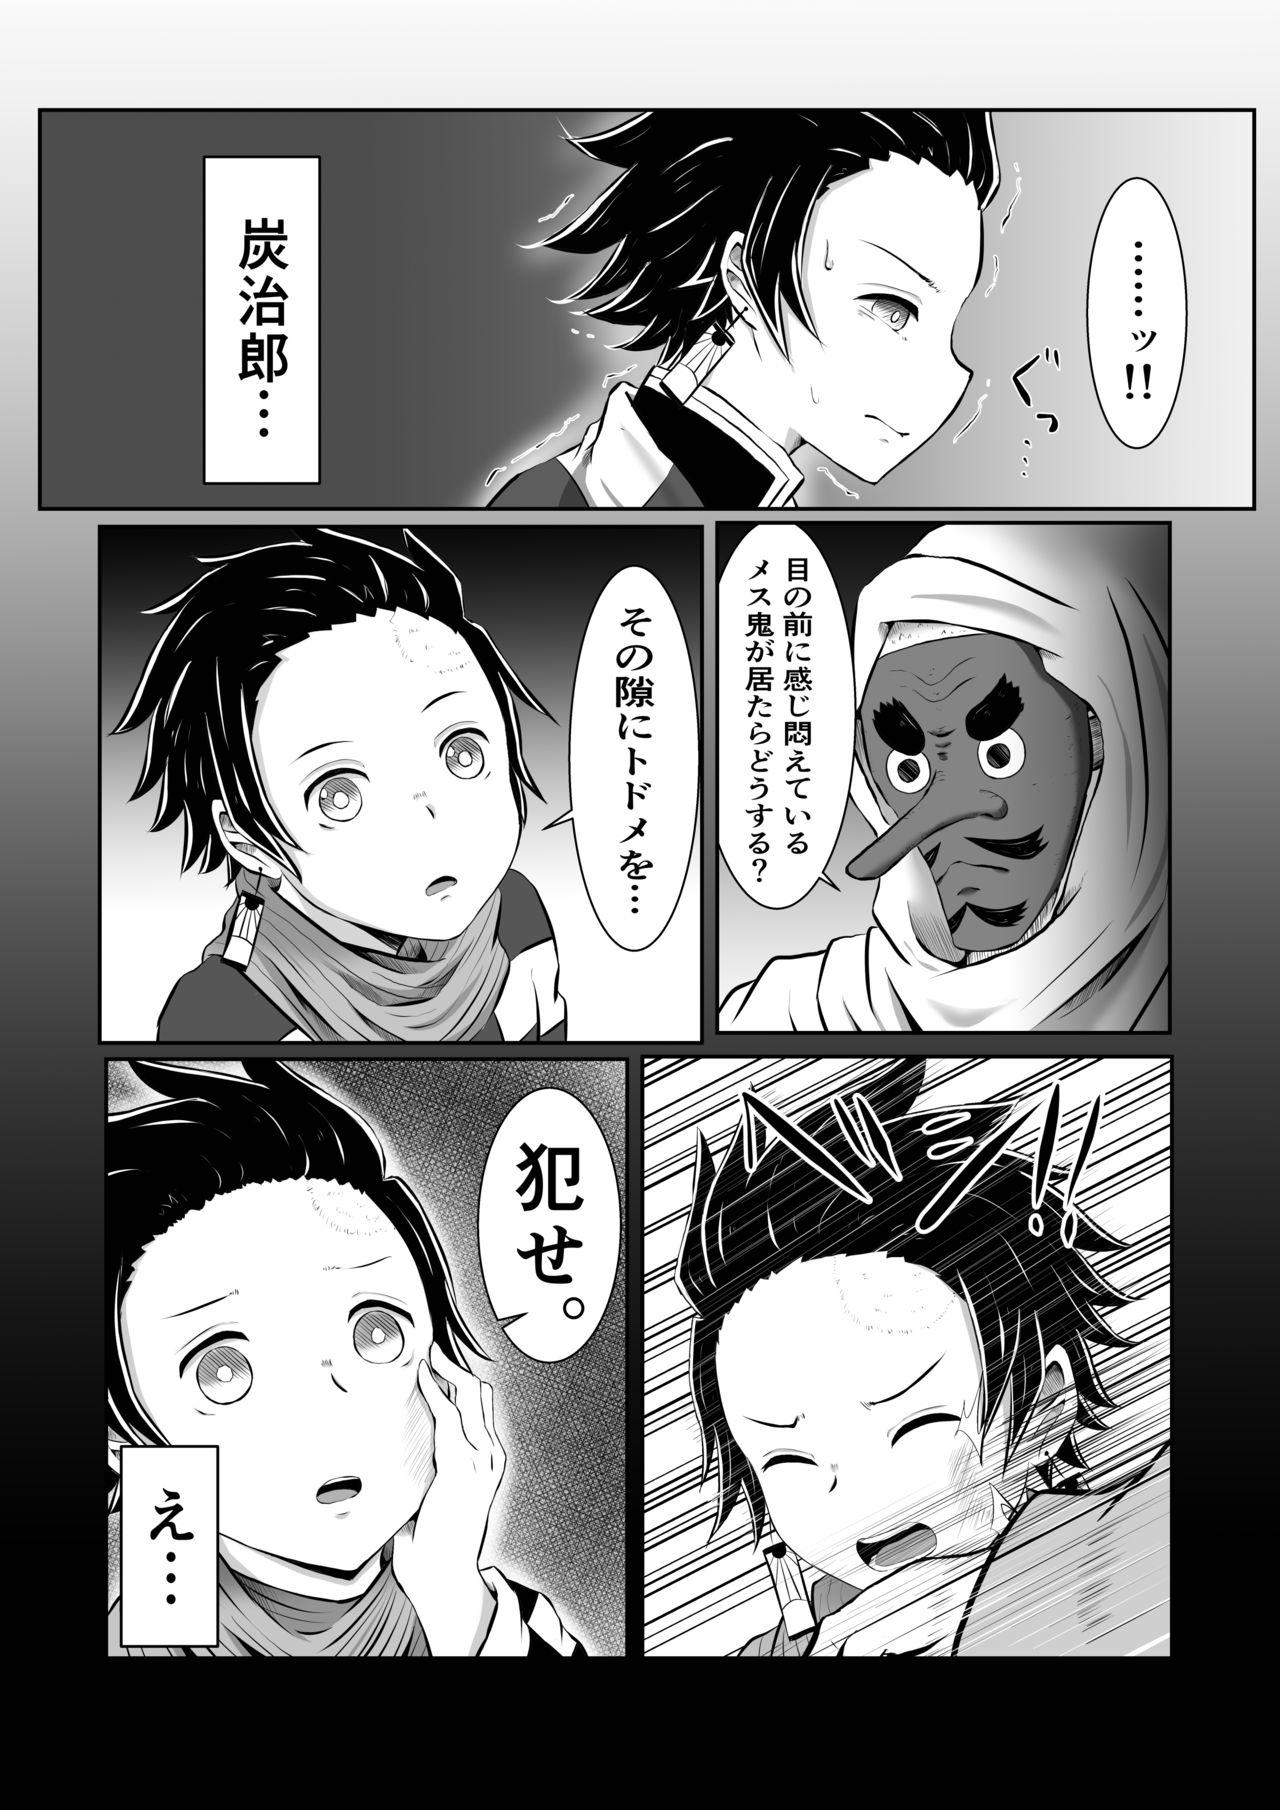 Hinokami Sex. 8